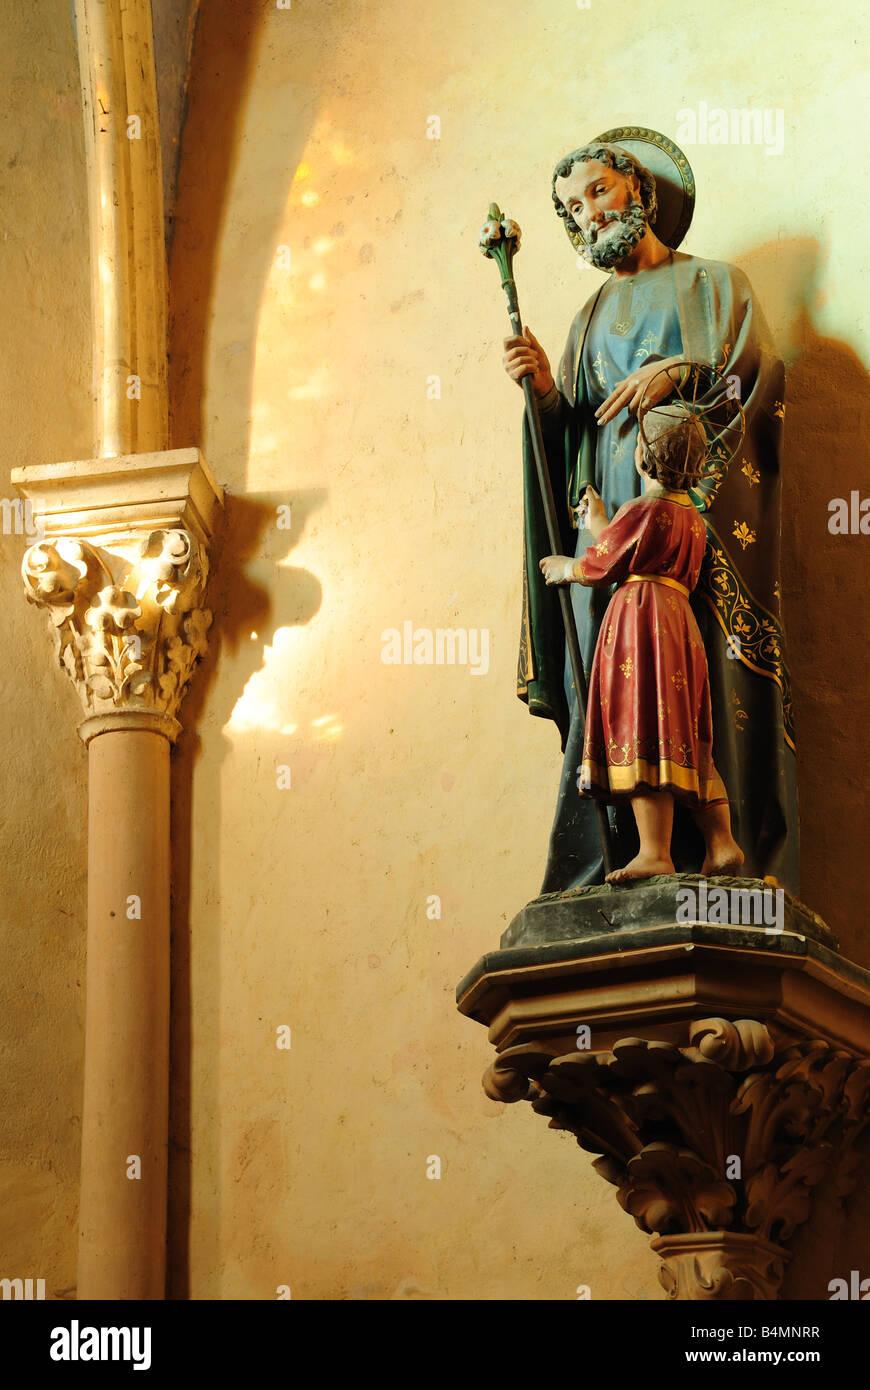 Painted statue of saint at Castelfranc Midi Pyrénées France - Stock Image